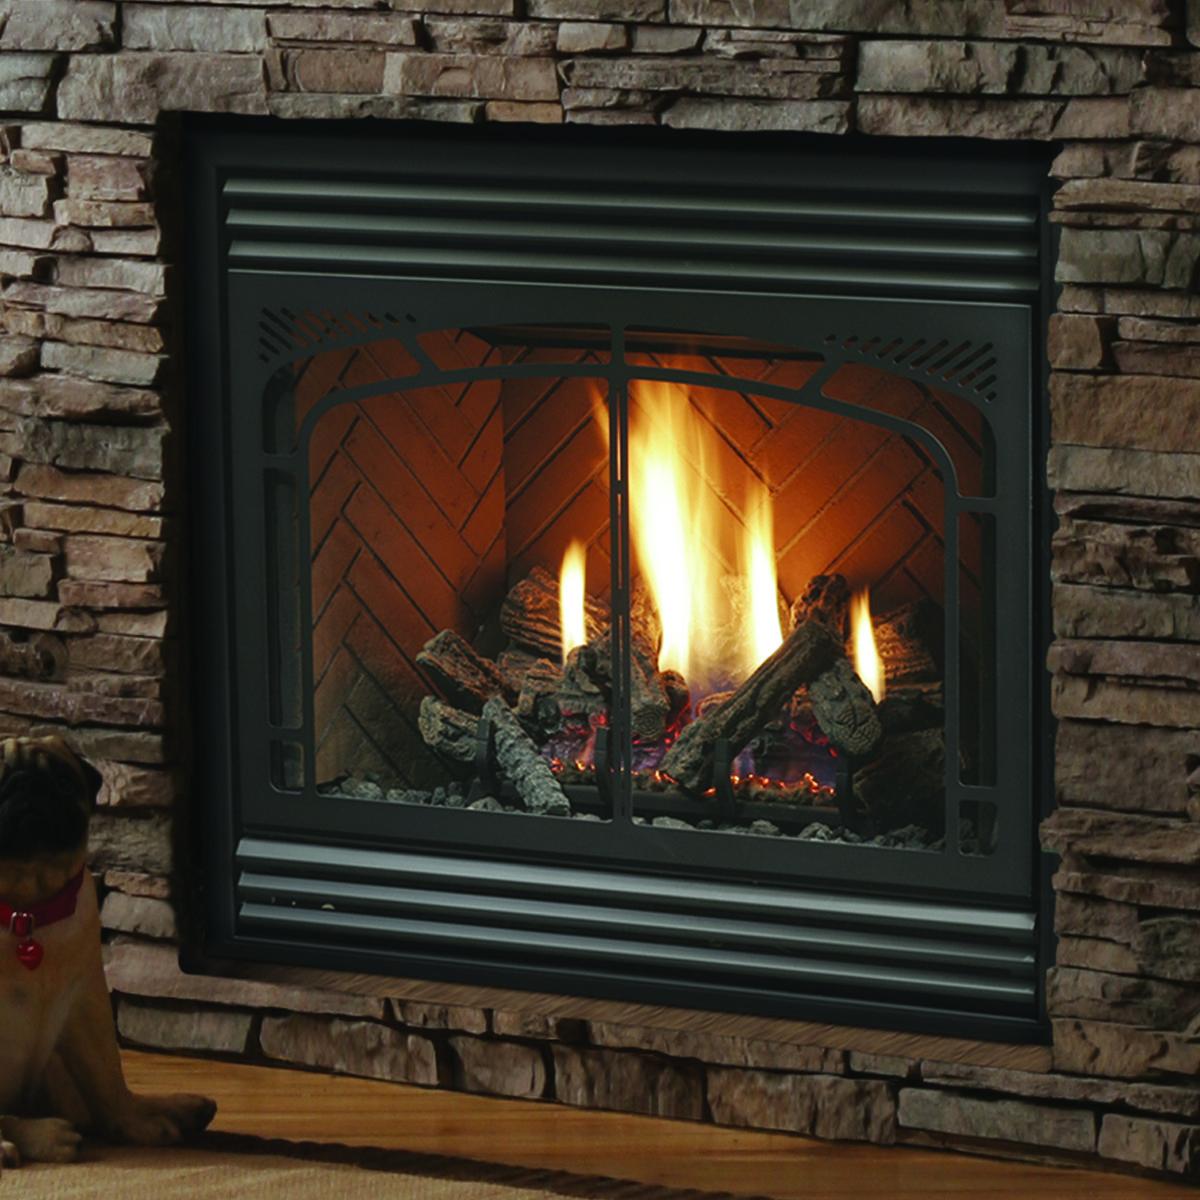 Kingsman Fireplace Direct Vent Fireplace Direct Vent Gas